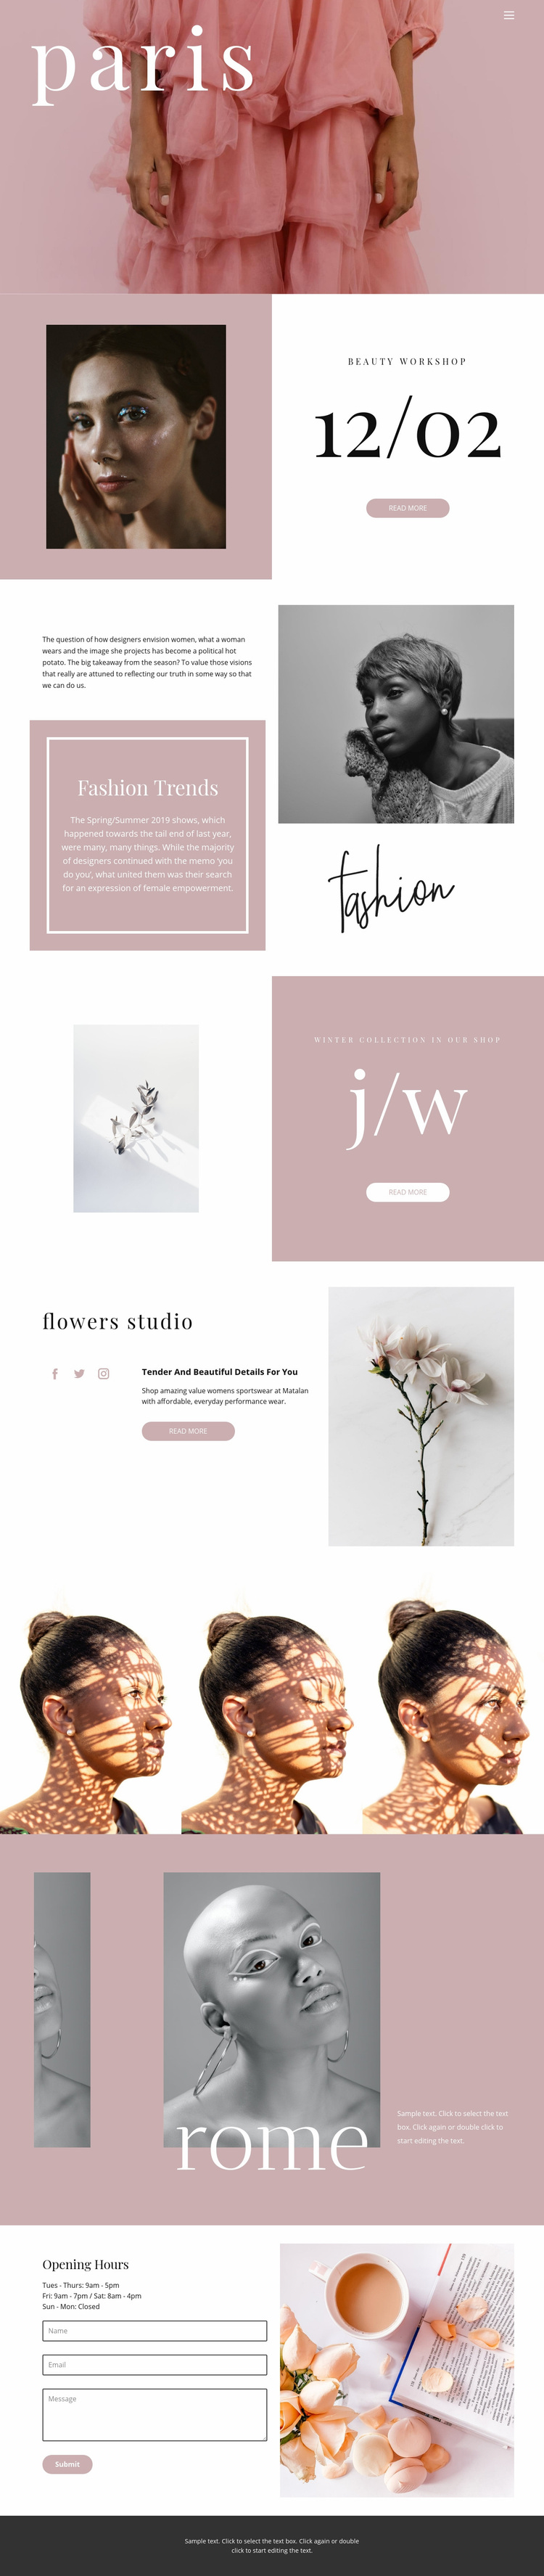 French fashion Web Page Designer